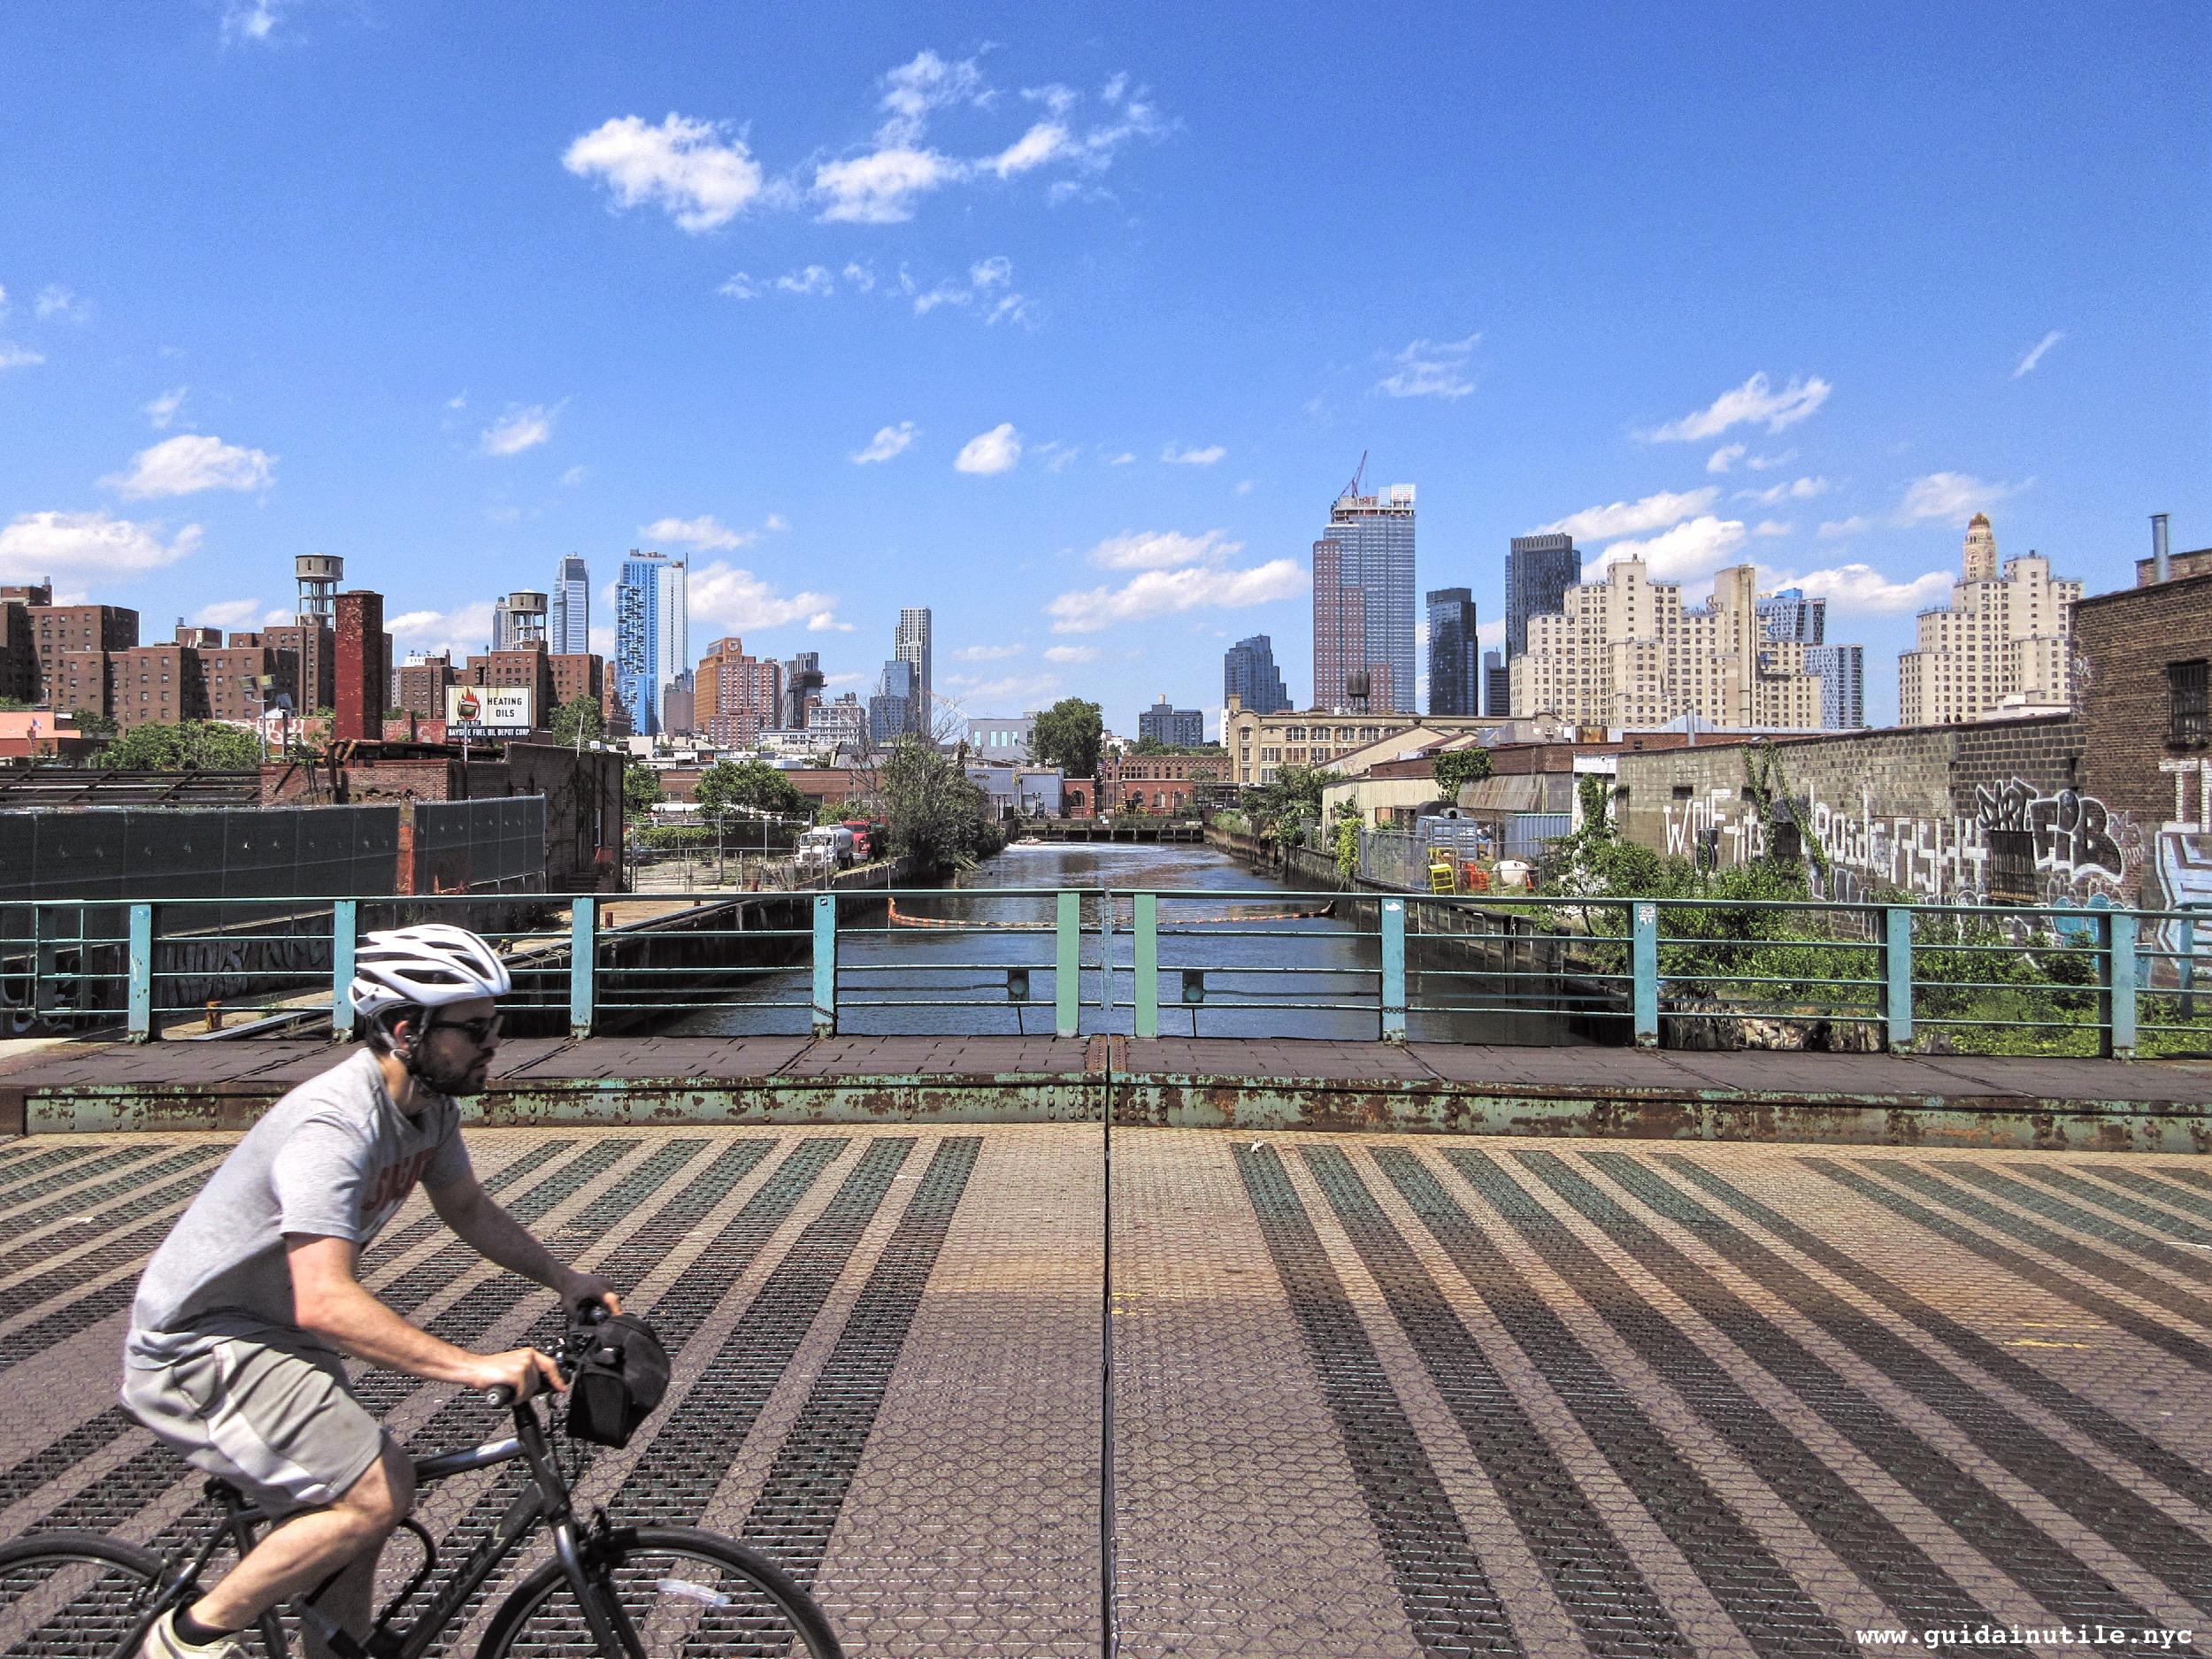 Gowanus, Brooklyn, Carroll Street Bridge, New York City